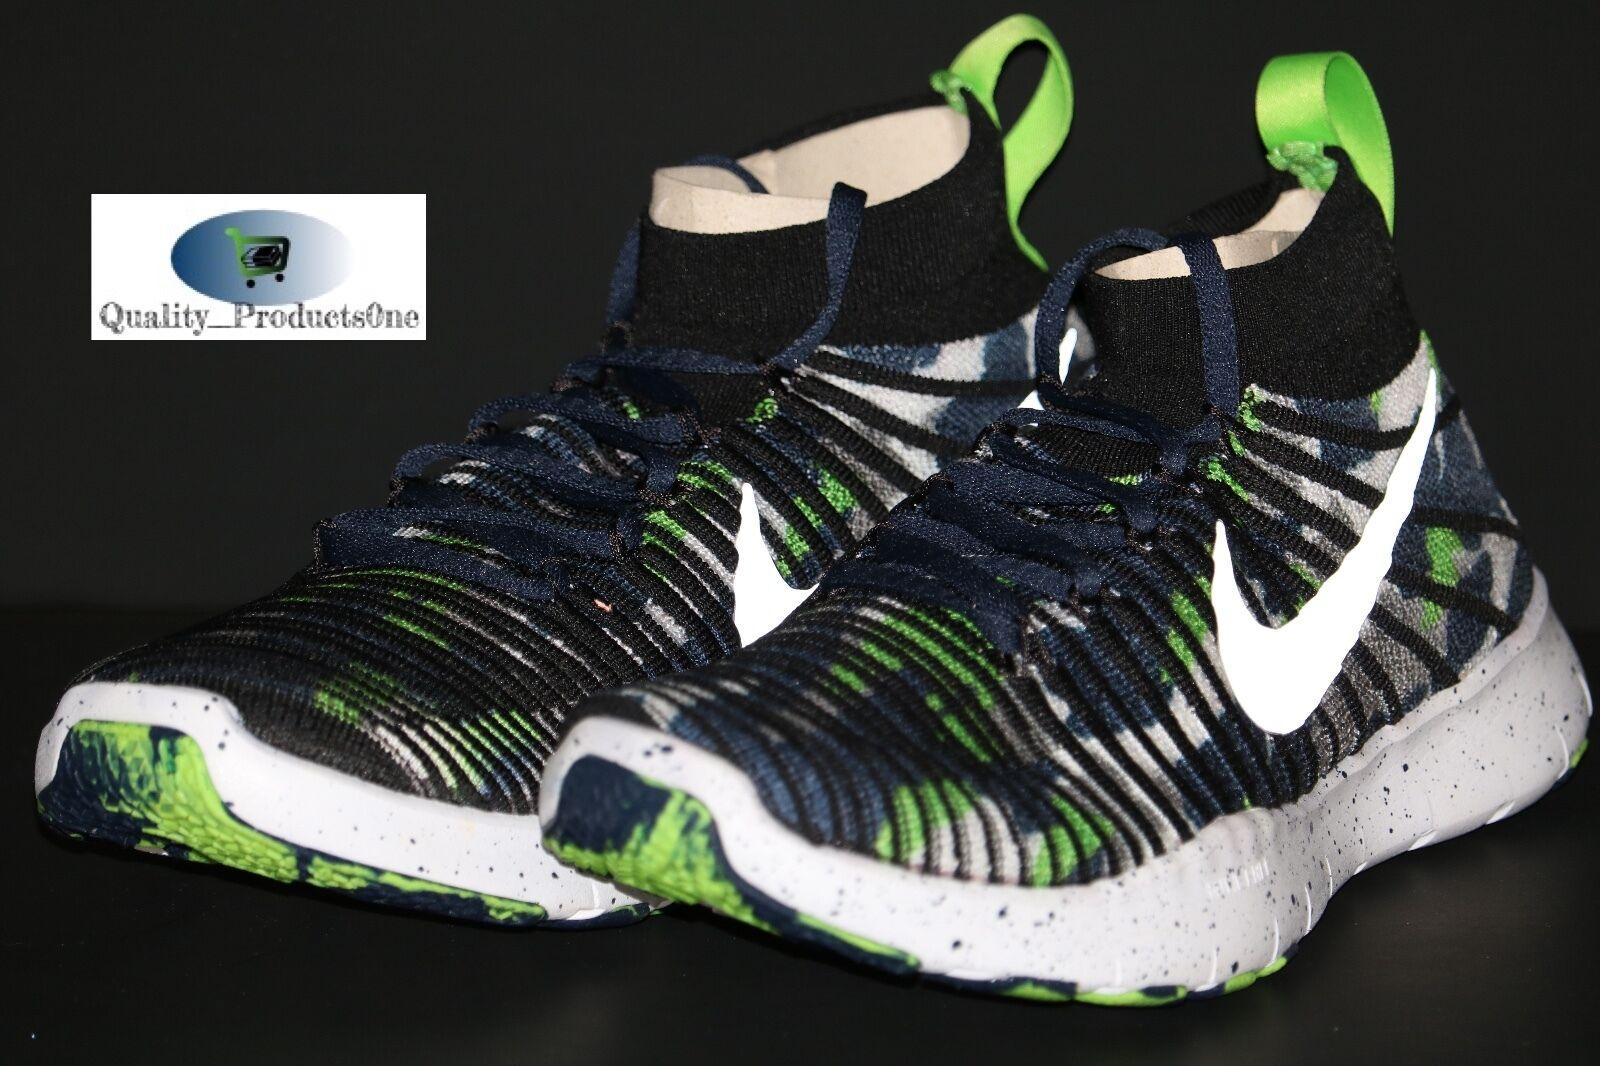 Nike libera treno vigore flyknit amp dangeruss dangeruss amp wilson seahawks 840299 400 sz 9,5 6d28c3